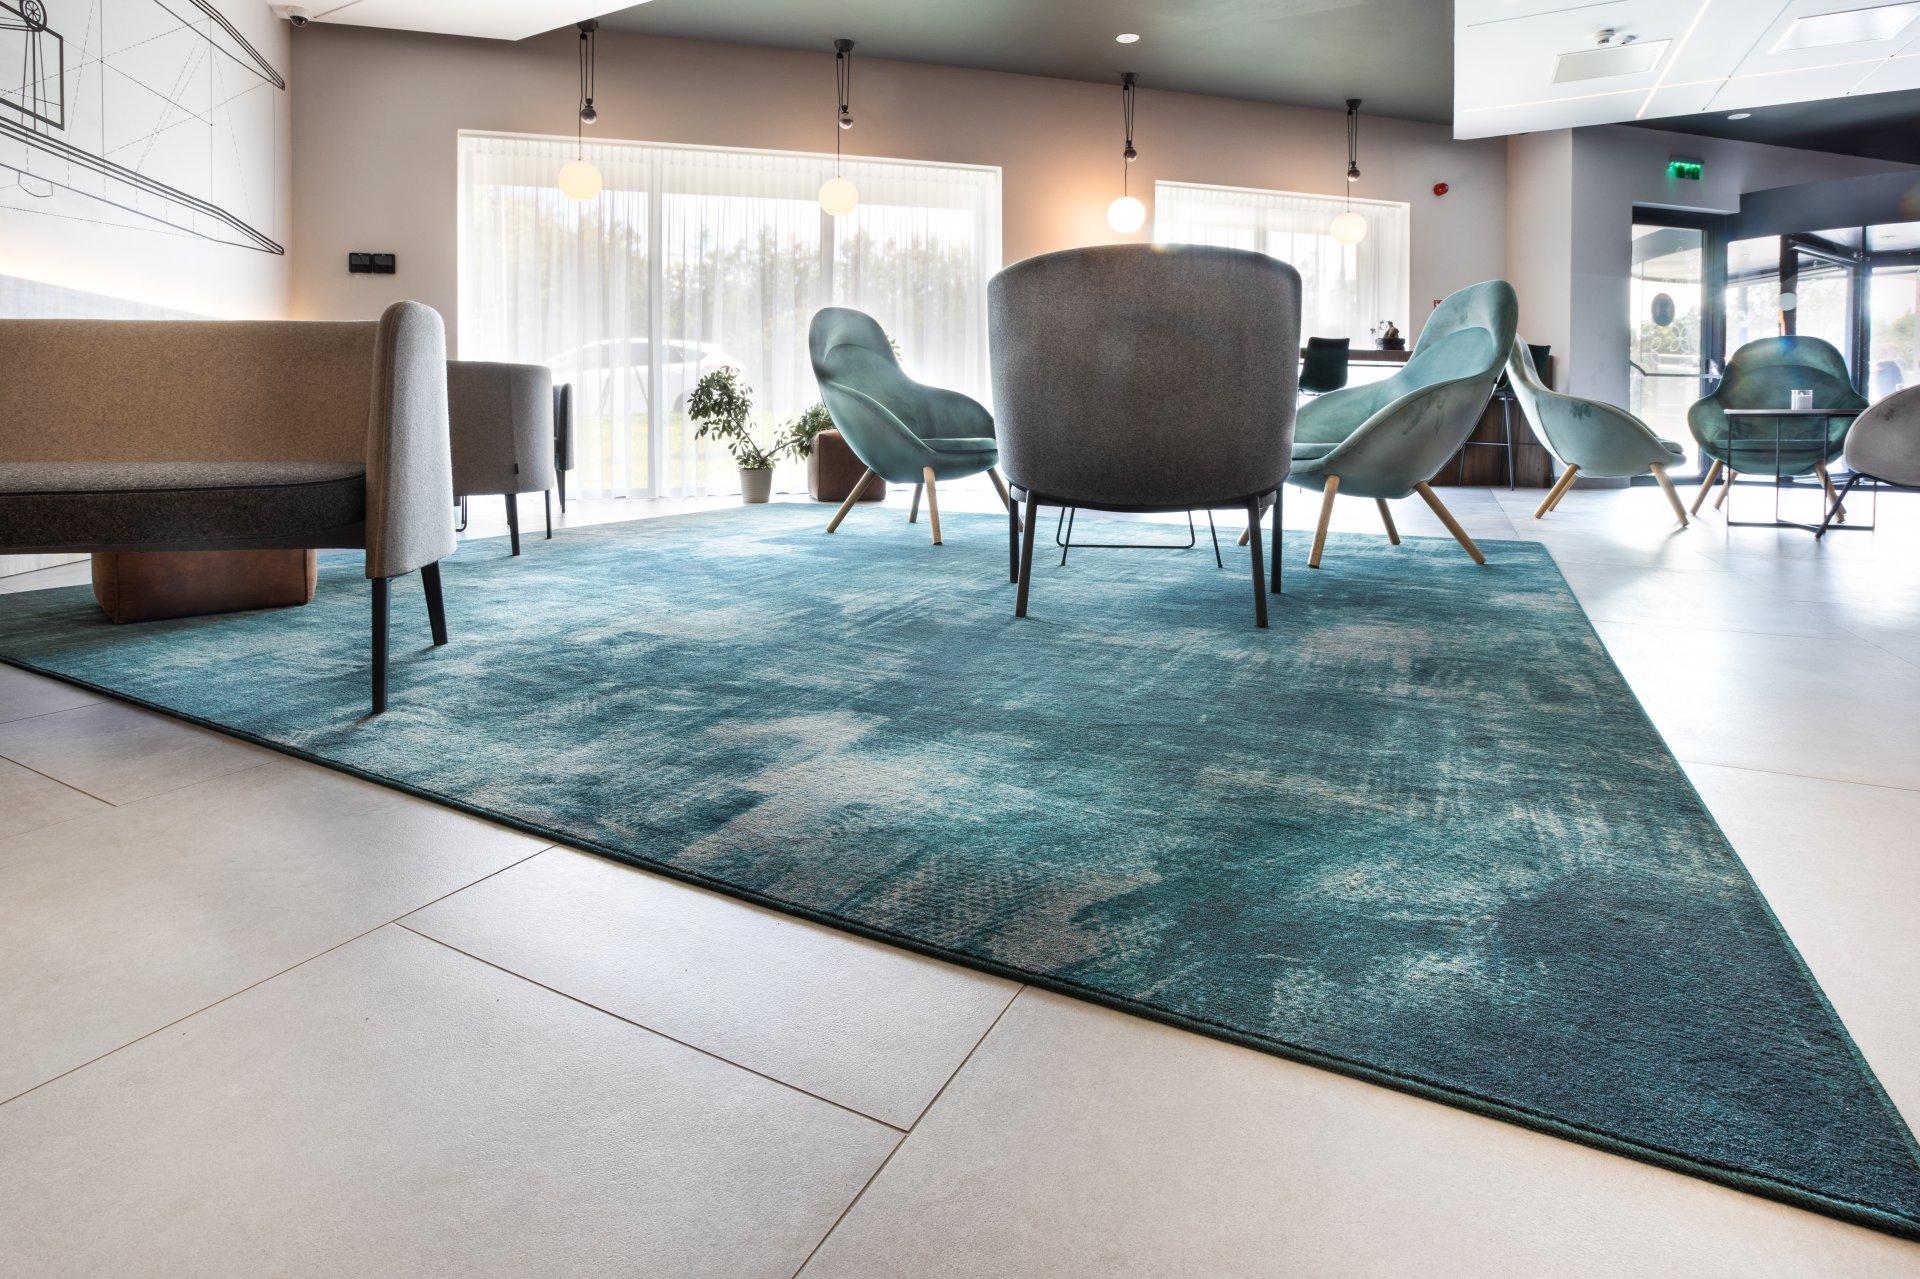 20200625-carpet-and-more-hilton-otopeni-21